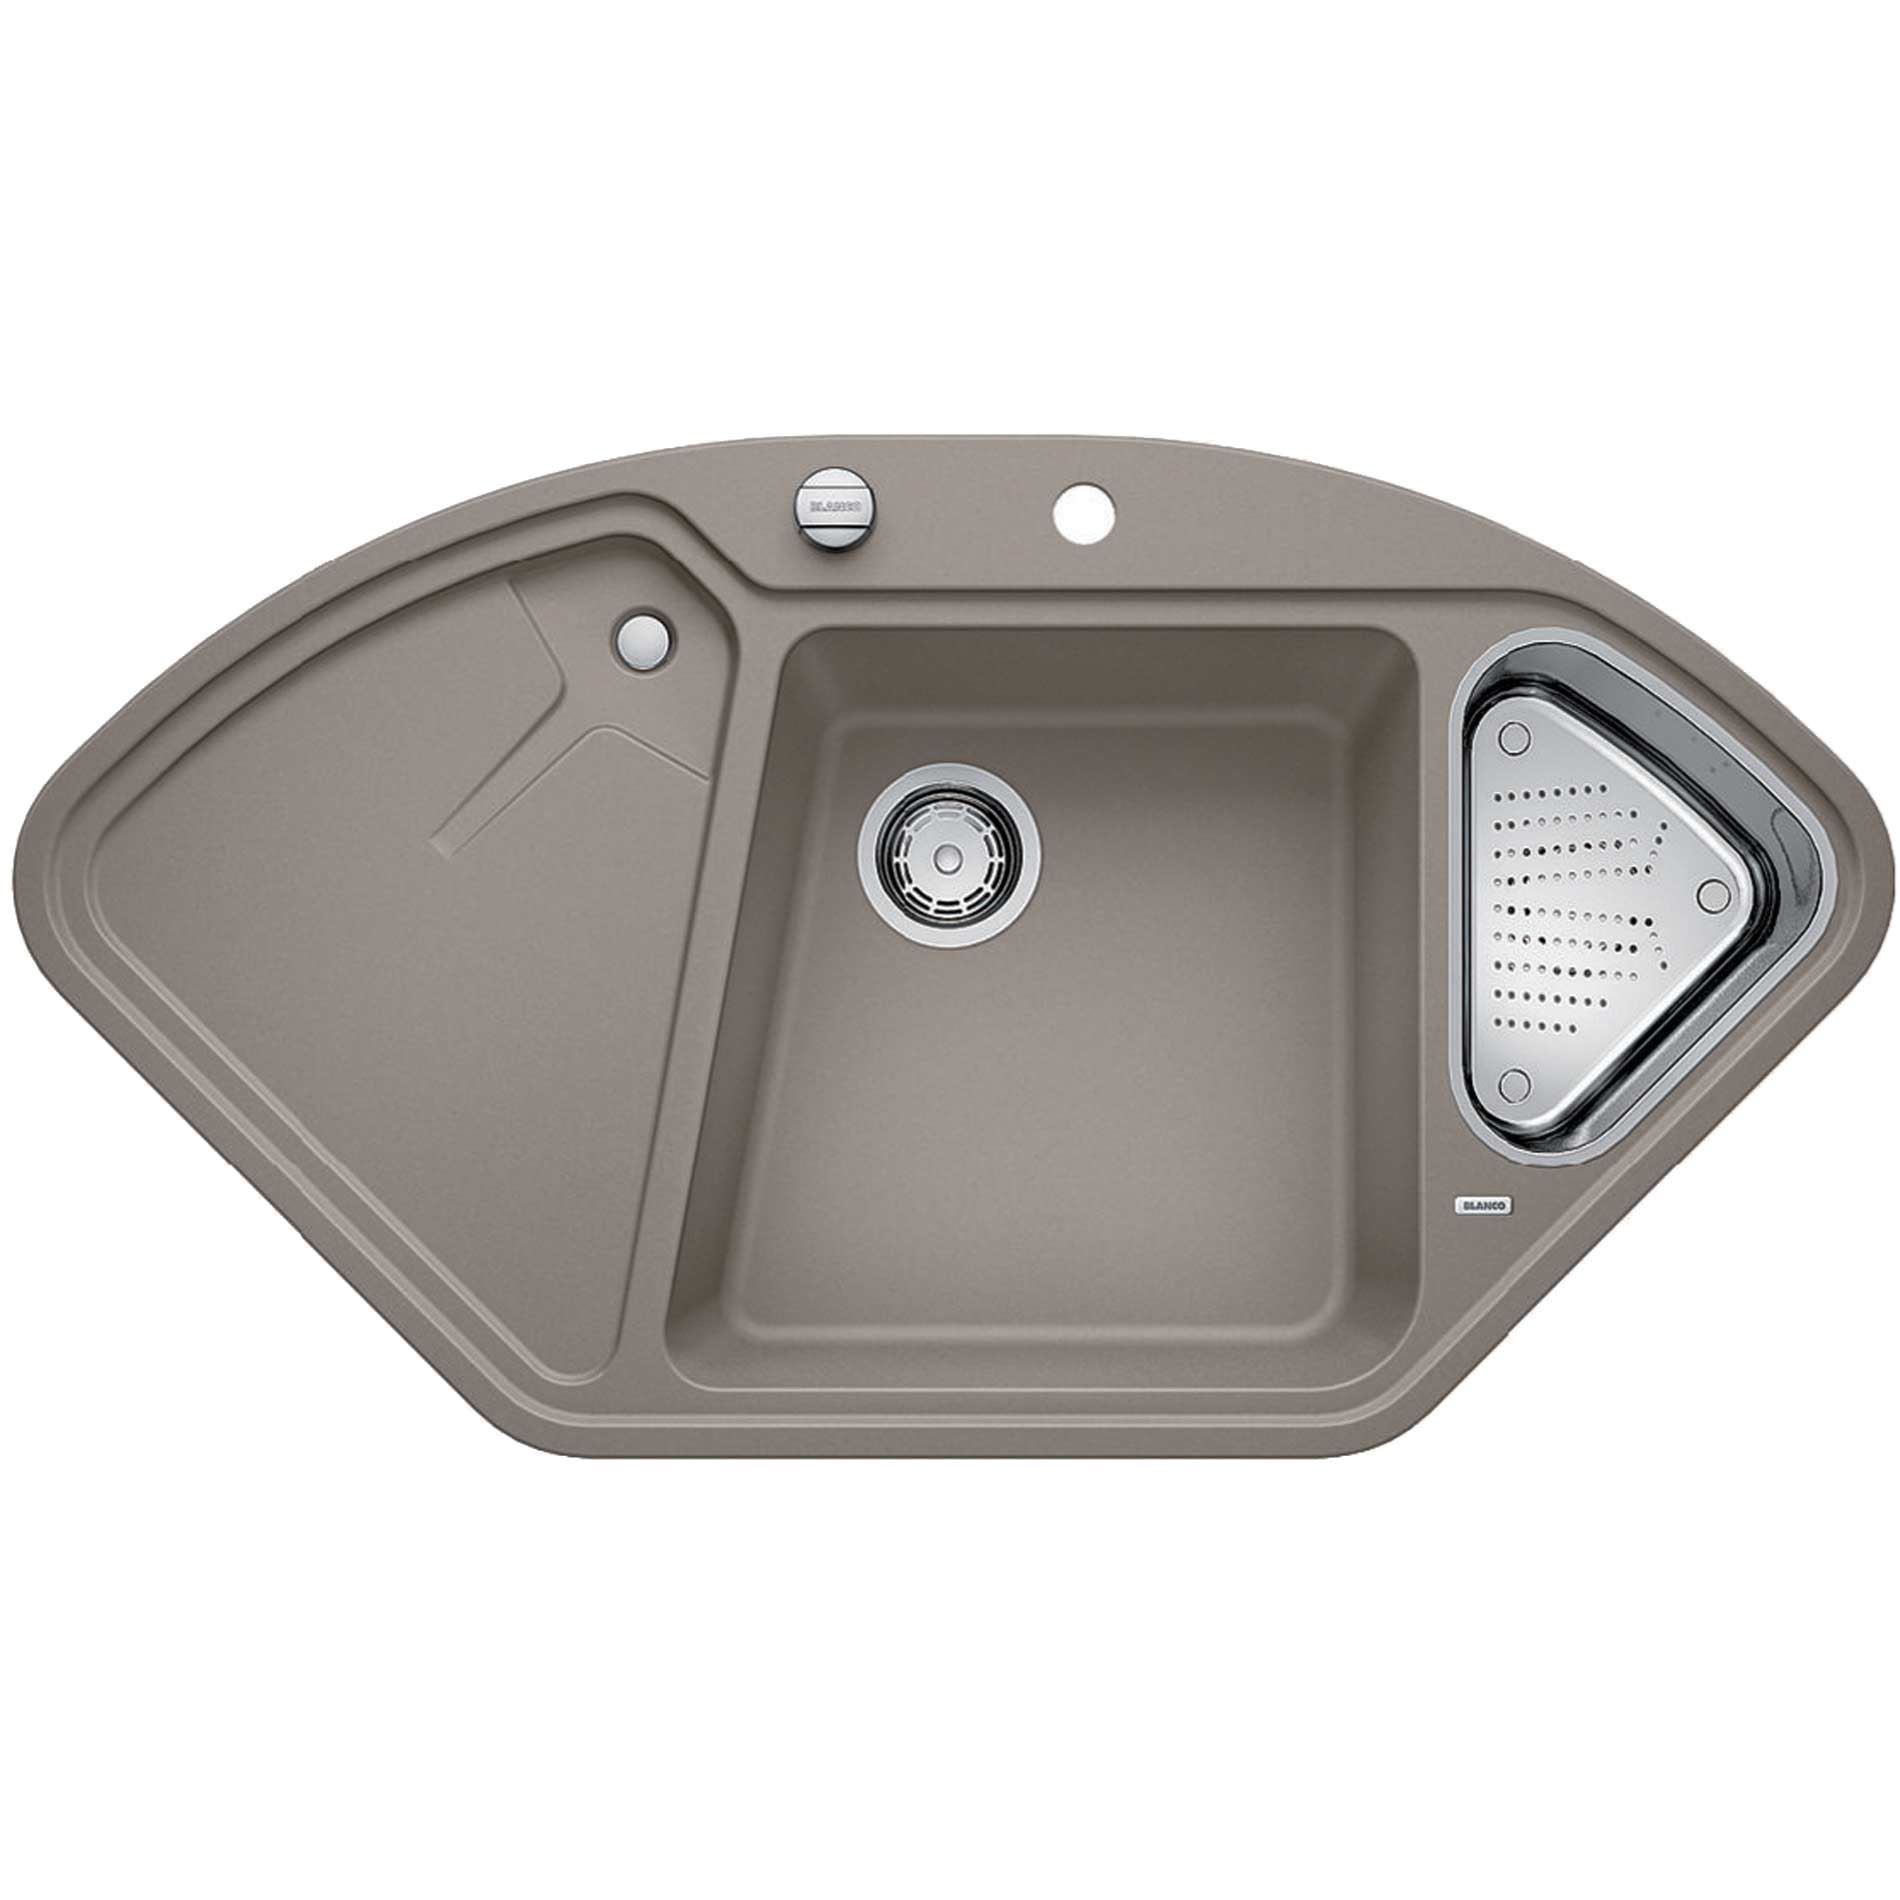 Blanco delta ii tartufo silgranit sink kitchen sinks taps for Silgranit ii sinks